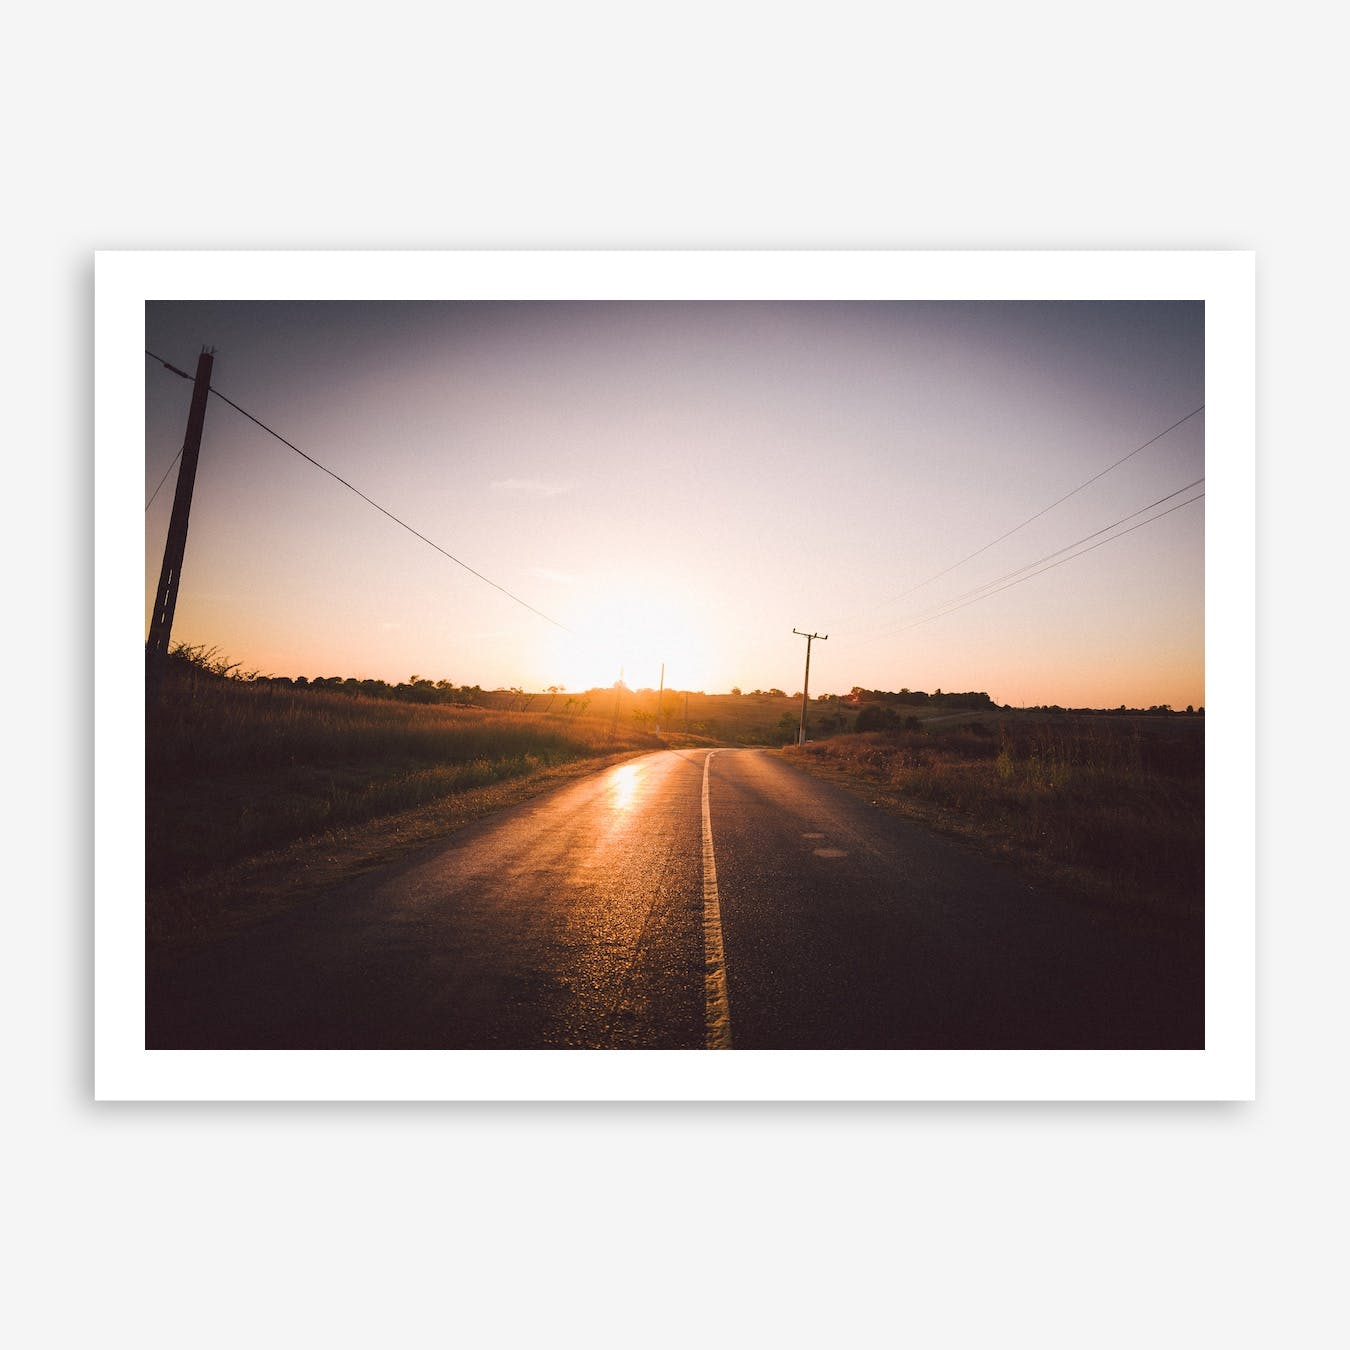 Sunset Trinidad x Cuba